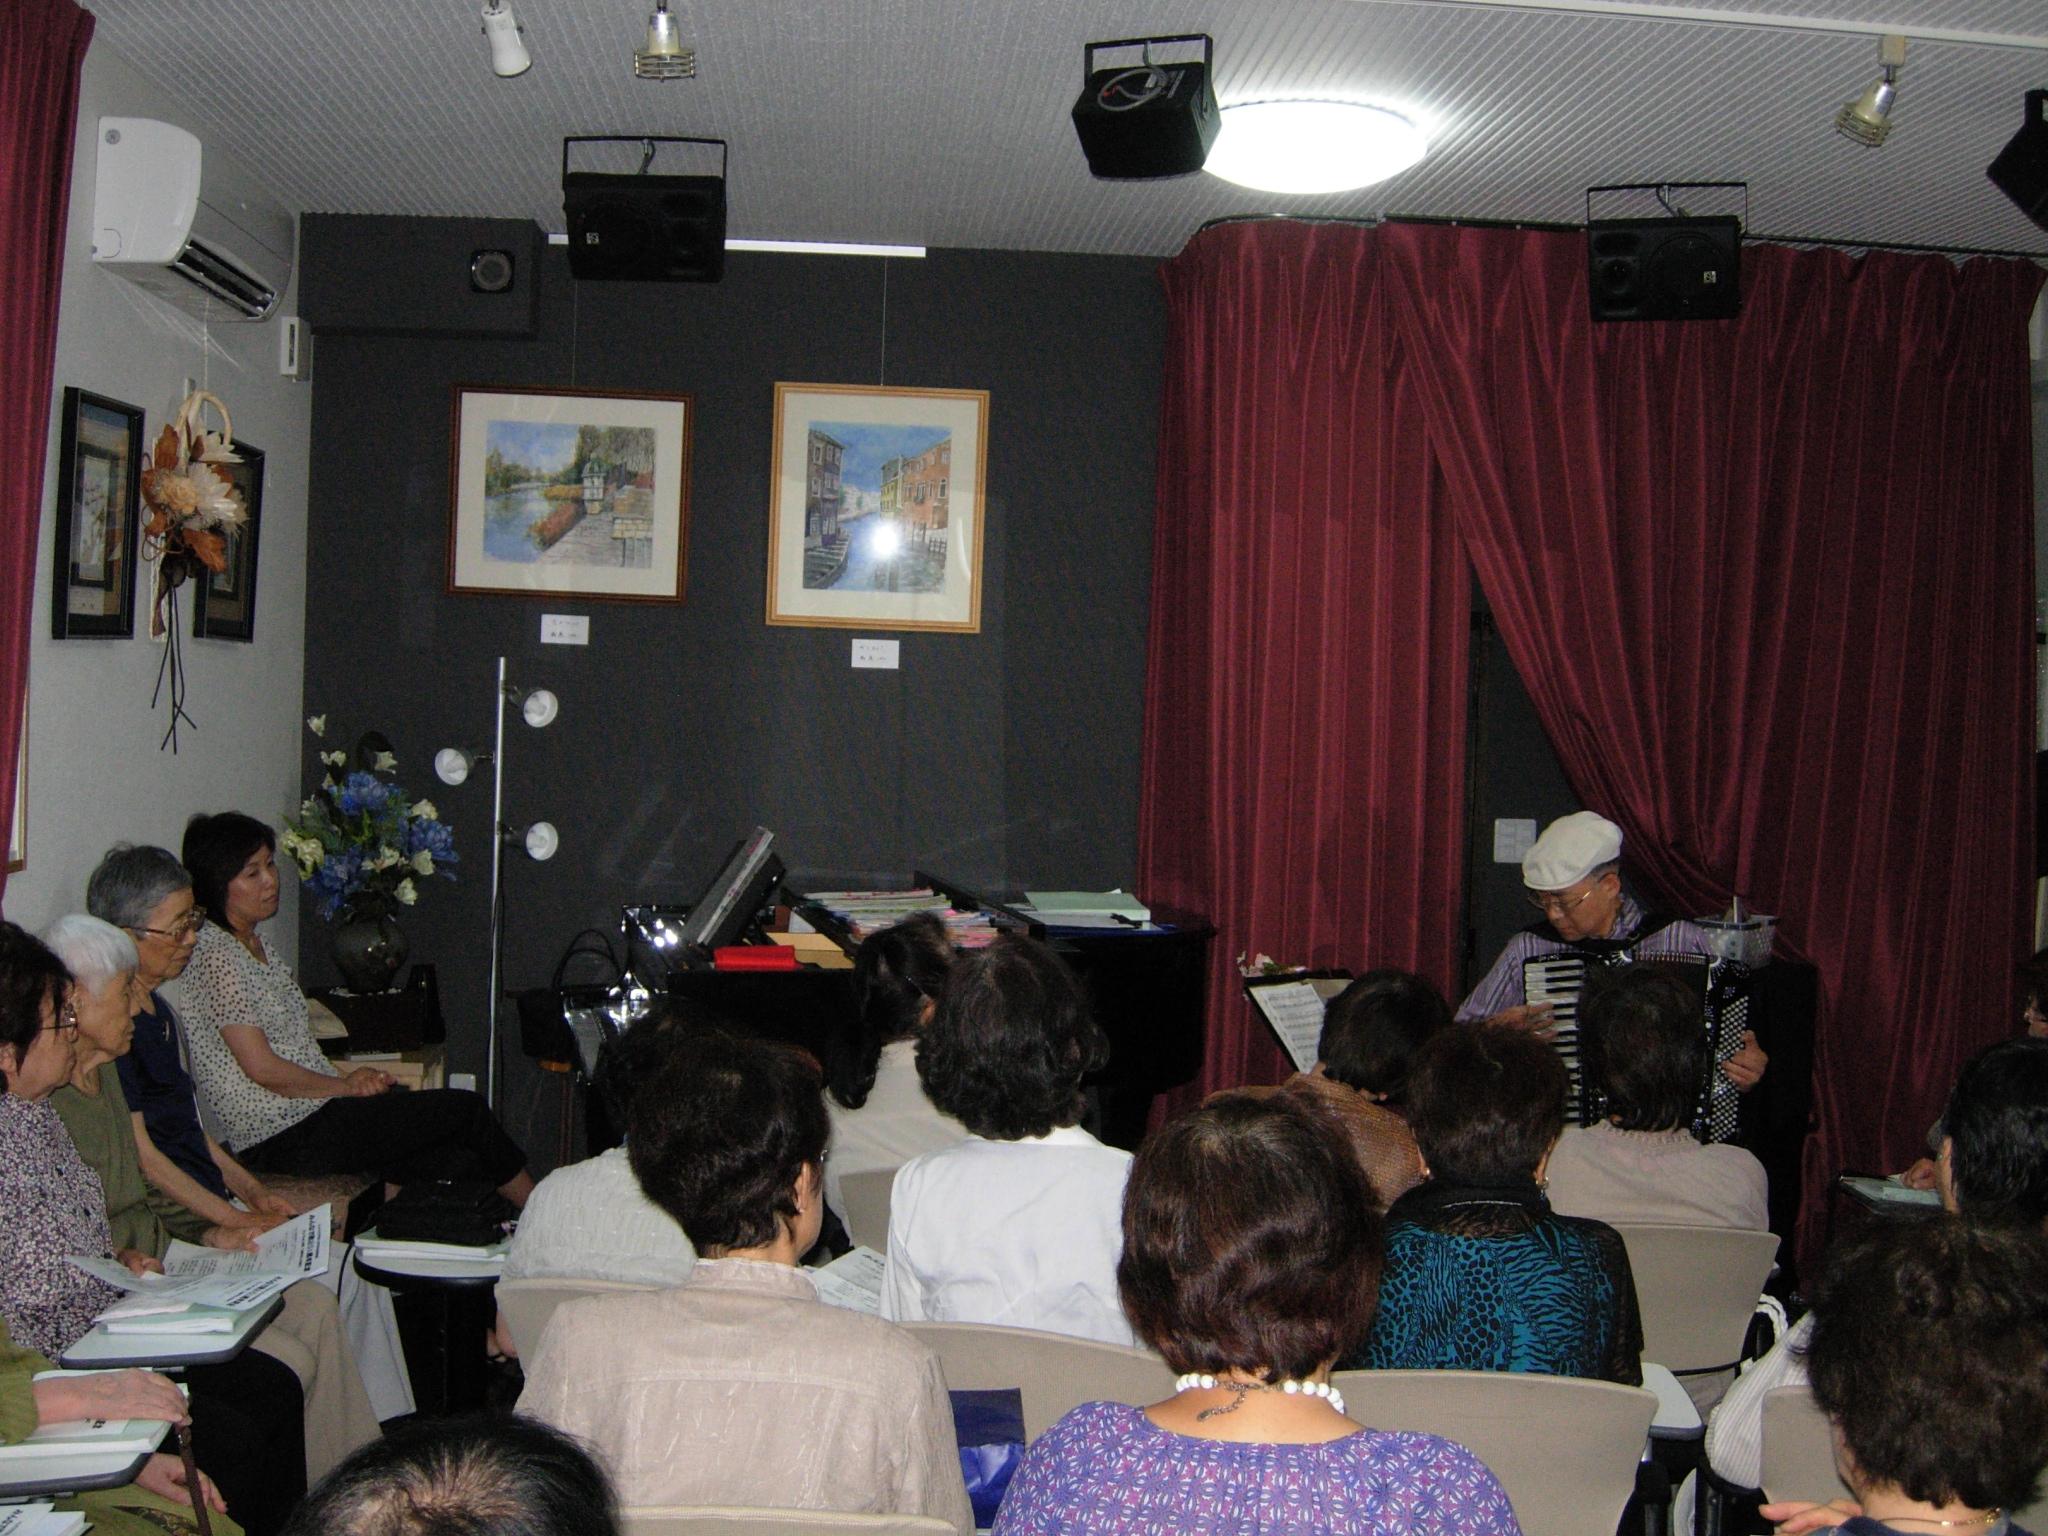 http://chanter-yachiyo.com/2011/07/09/2011_0705_115303-DSCN1451.JPG